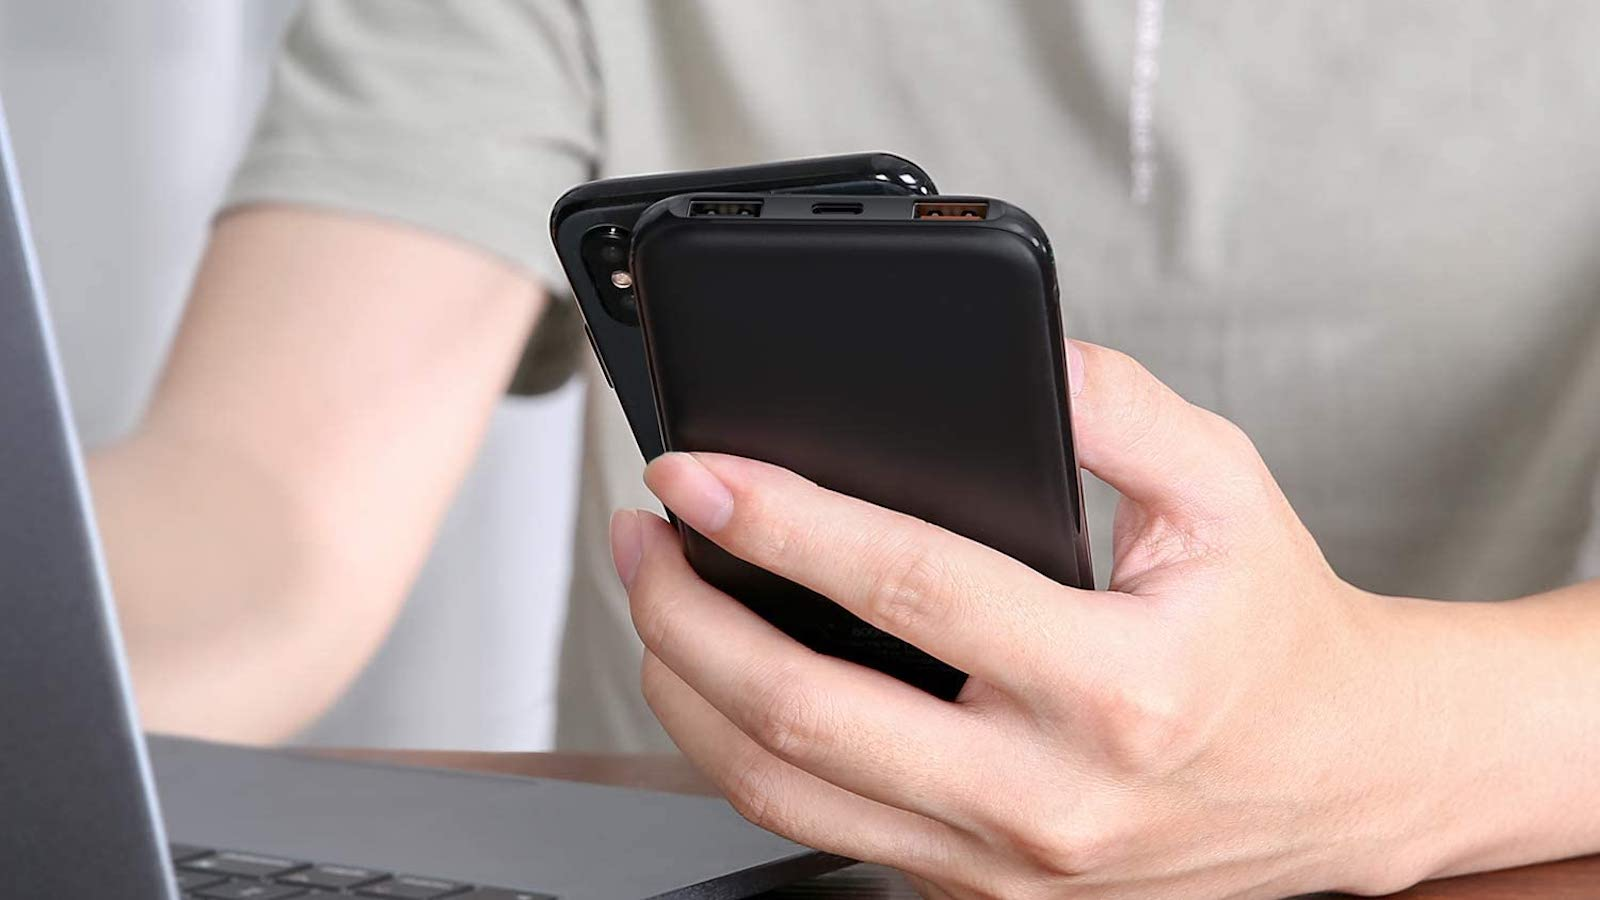 AUKEY Sprint Wireless 8,000 mAh Portable Charging Power Bank